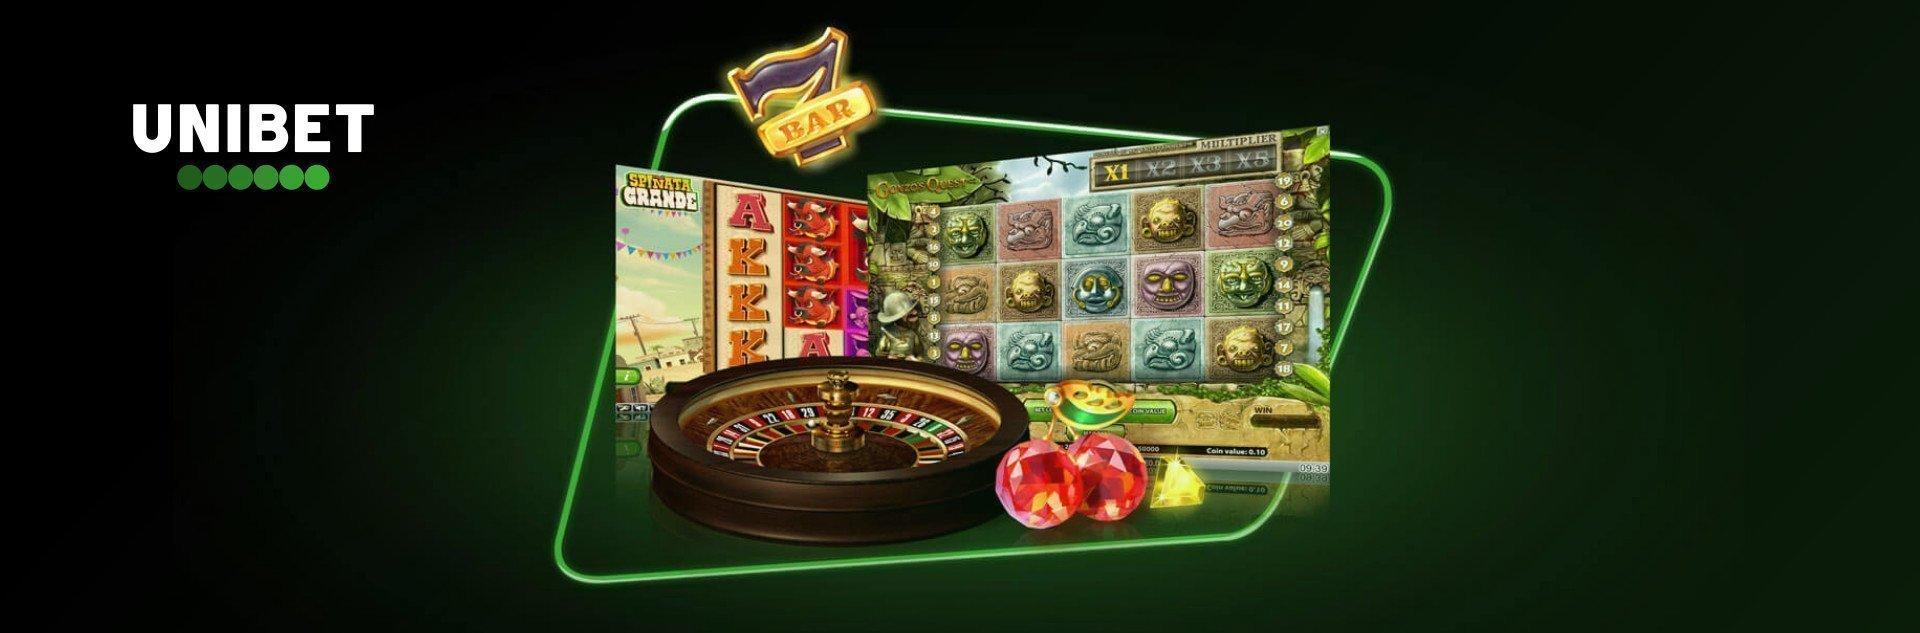 Unibet casino review CA